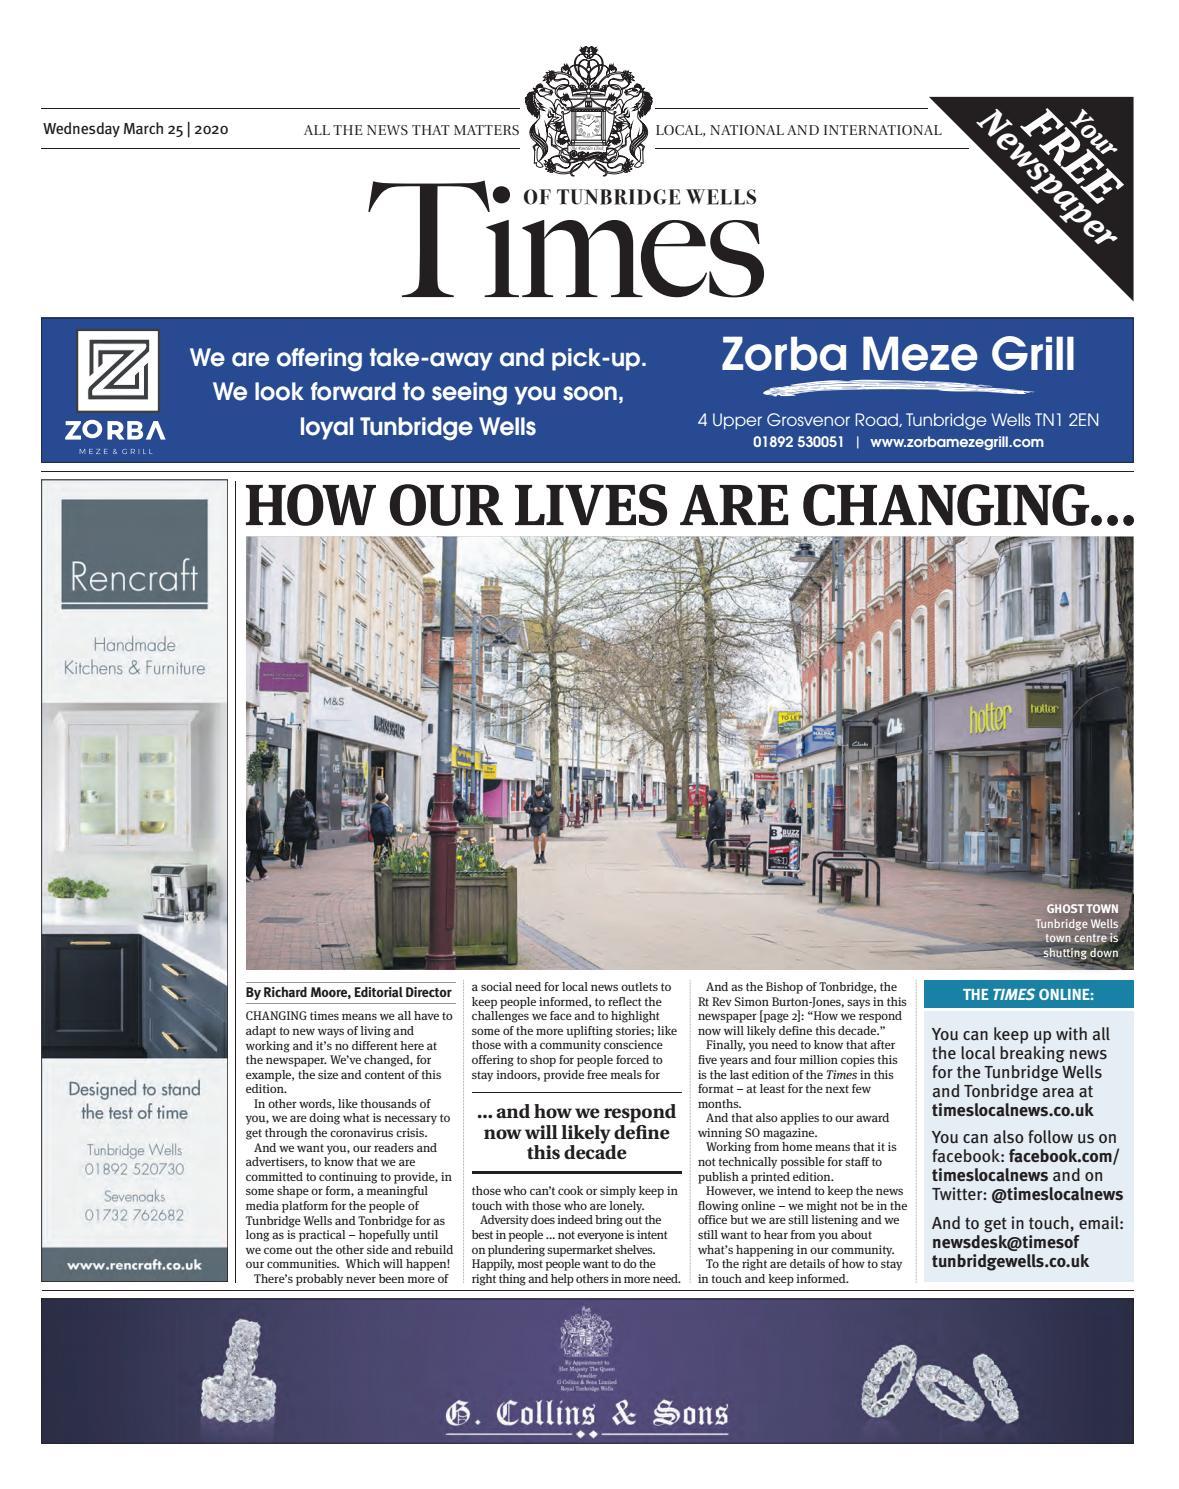 Times Of Tunbridge Wells 25th March 2020 By One Media Issuu